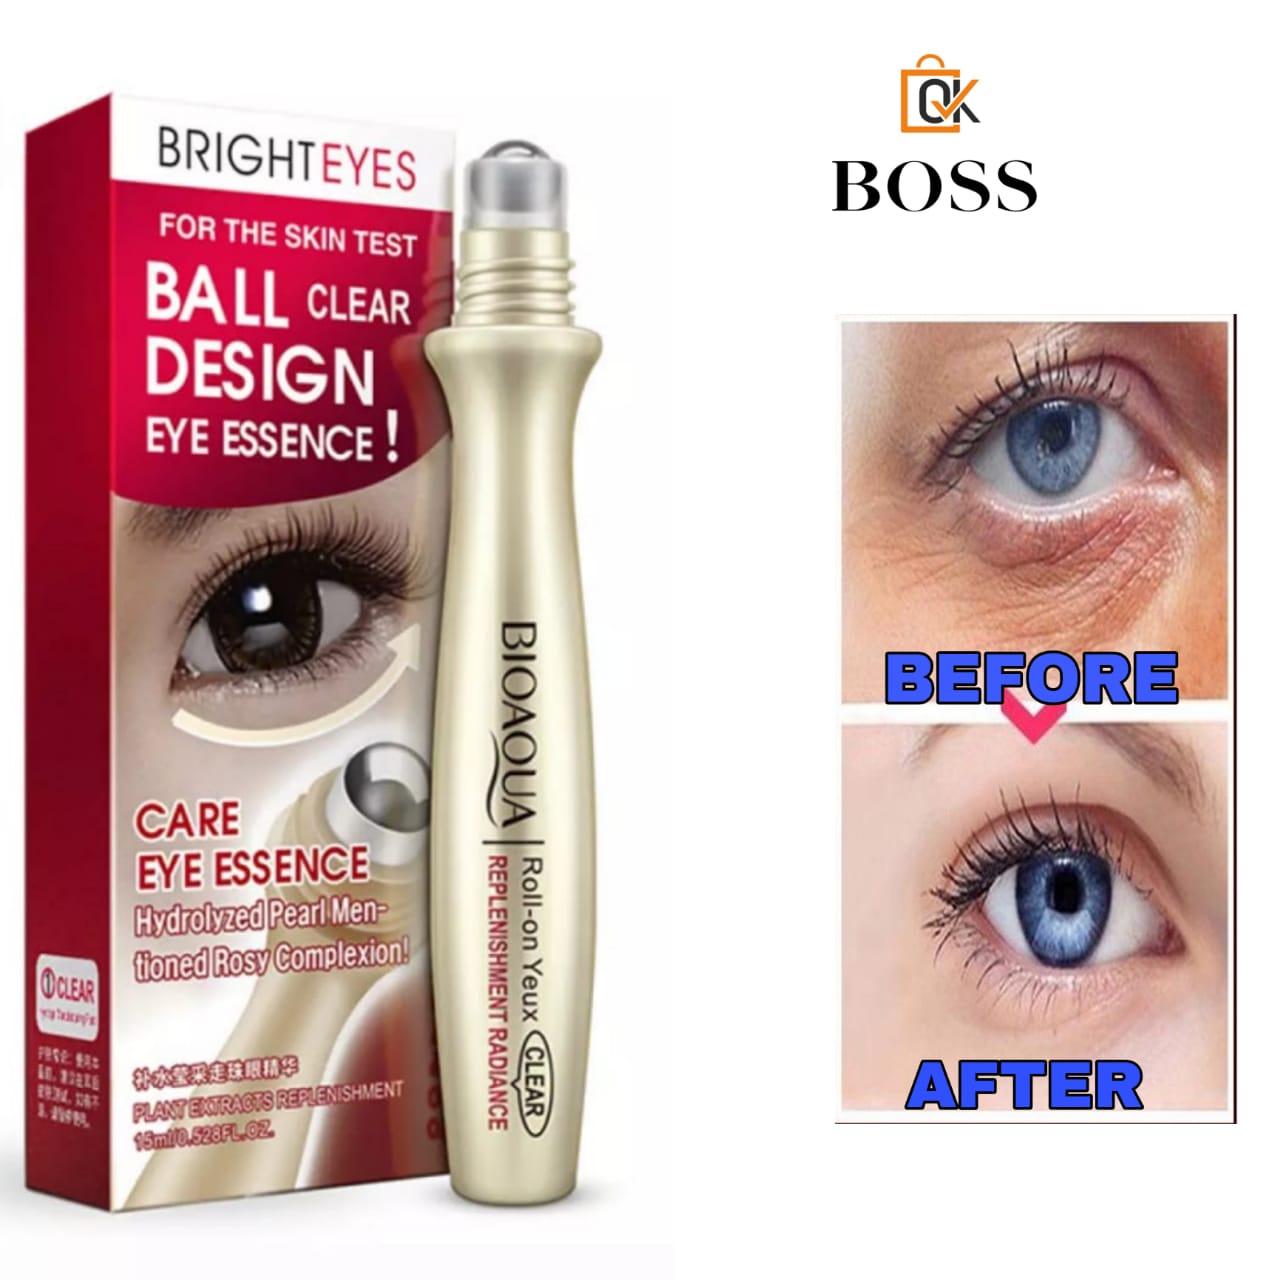 Best Quality BioAqua Anti-Wrinkle Puffiness Eye Bag Removal Roll-On Eye Ball For Dark Circle Skin Care 15ml